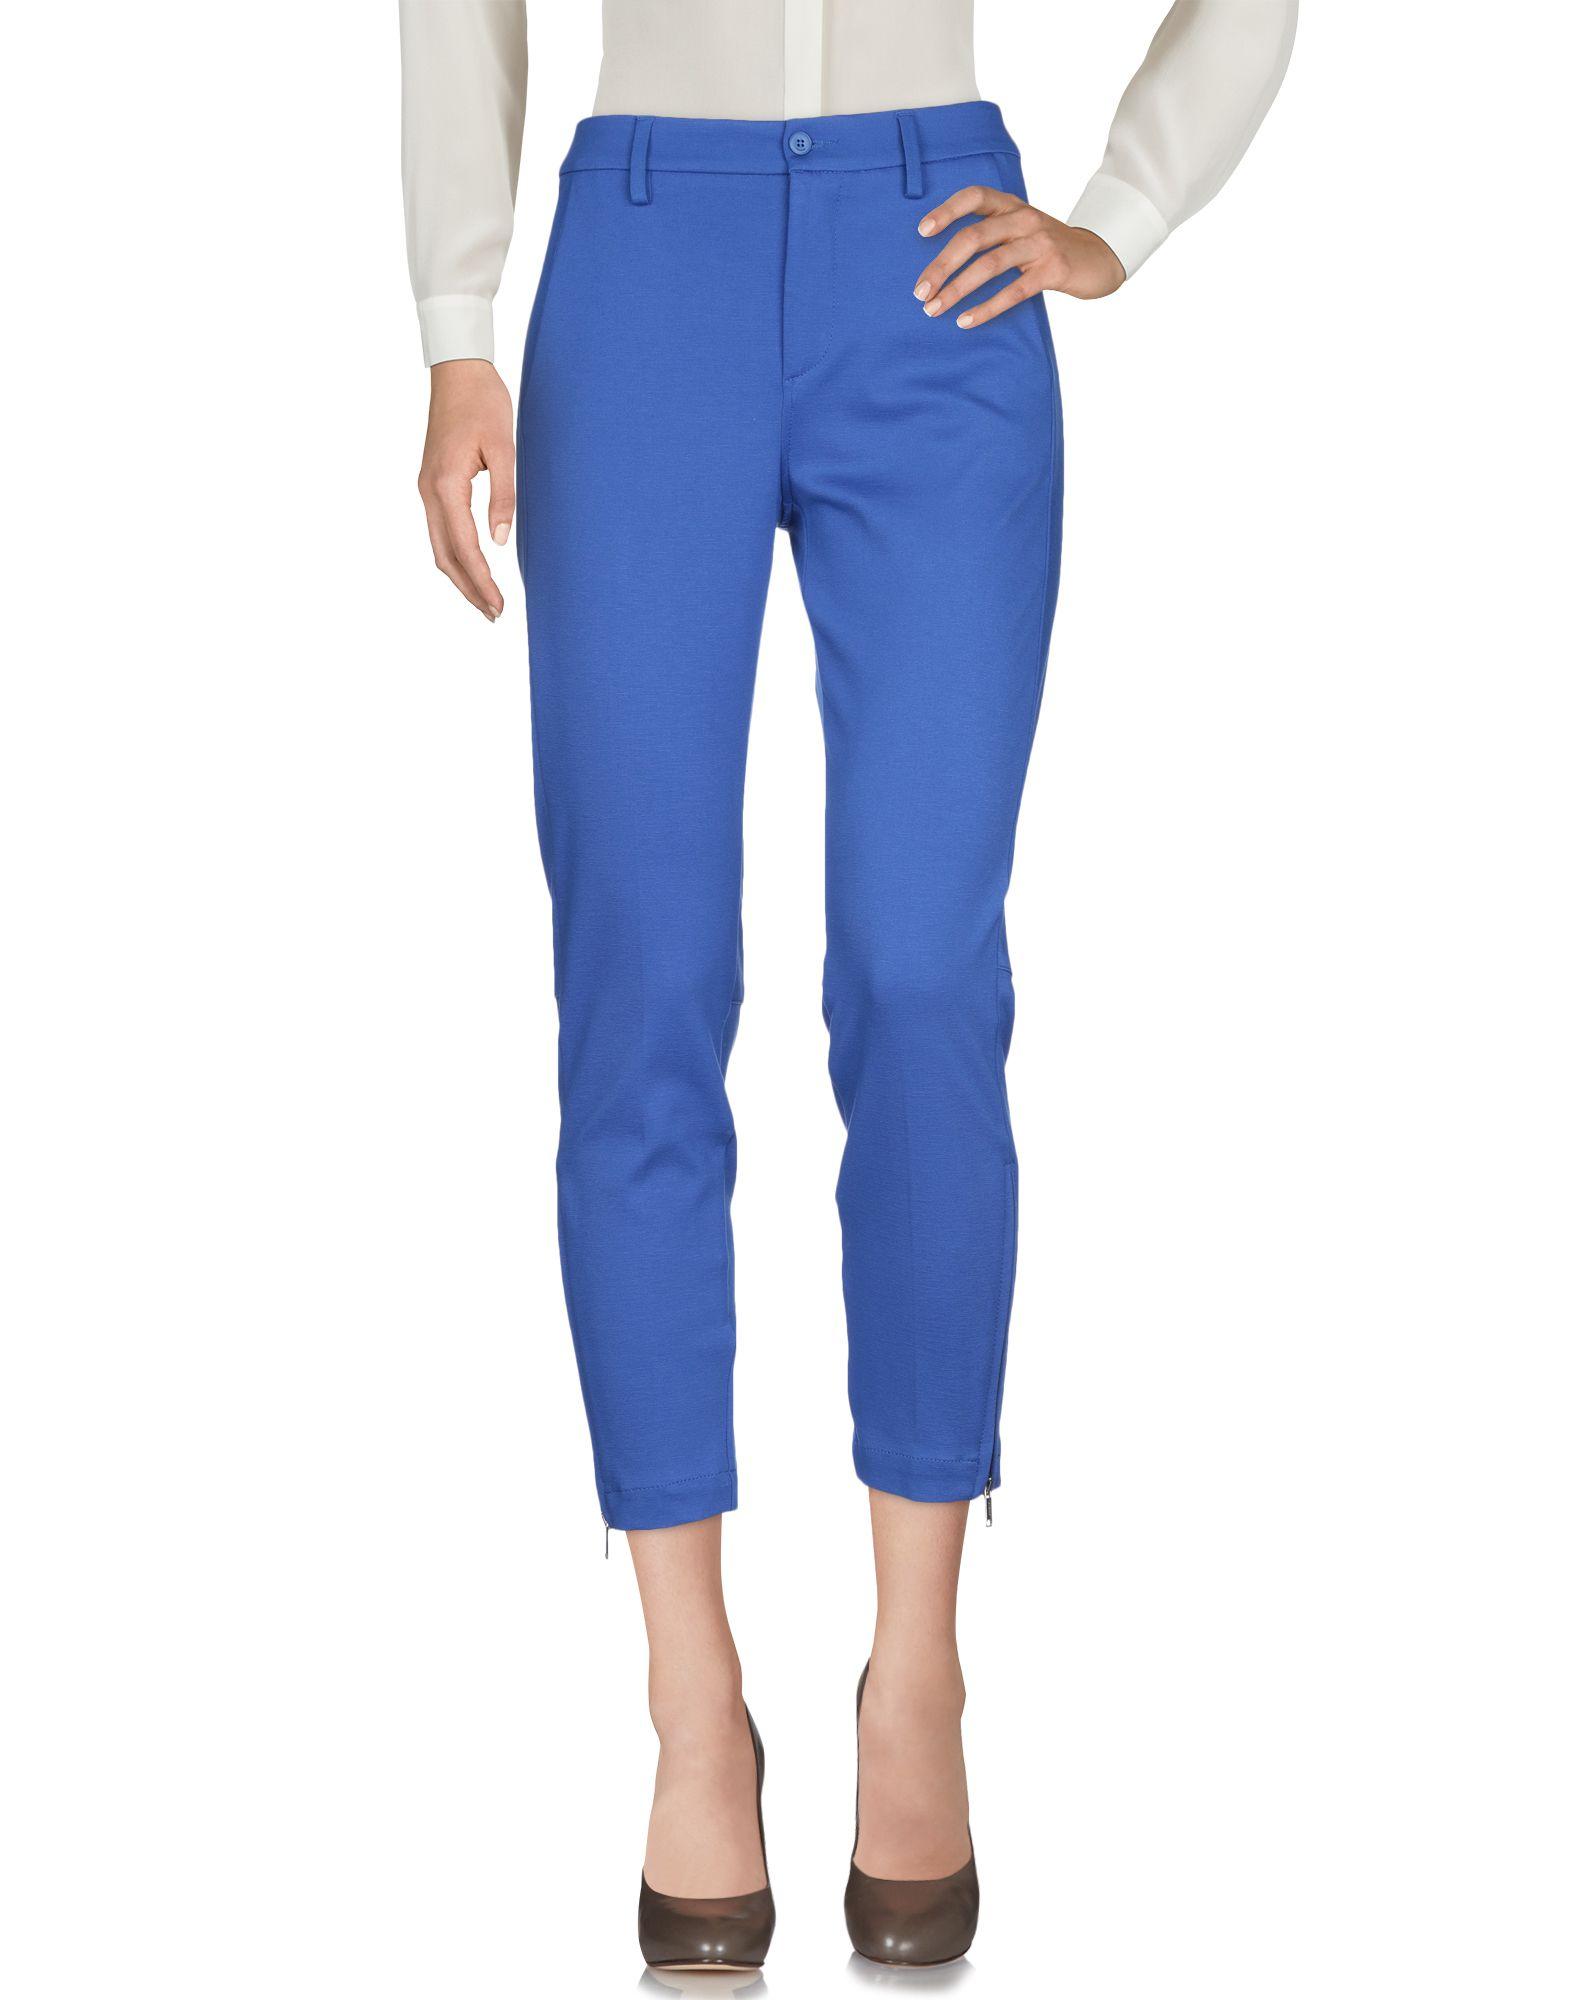 Pantalone Dondup Dondup donna - 13214043FS  Rabattaktionen